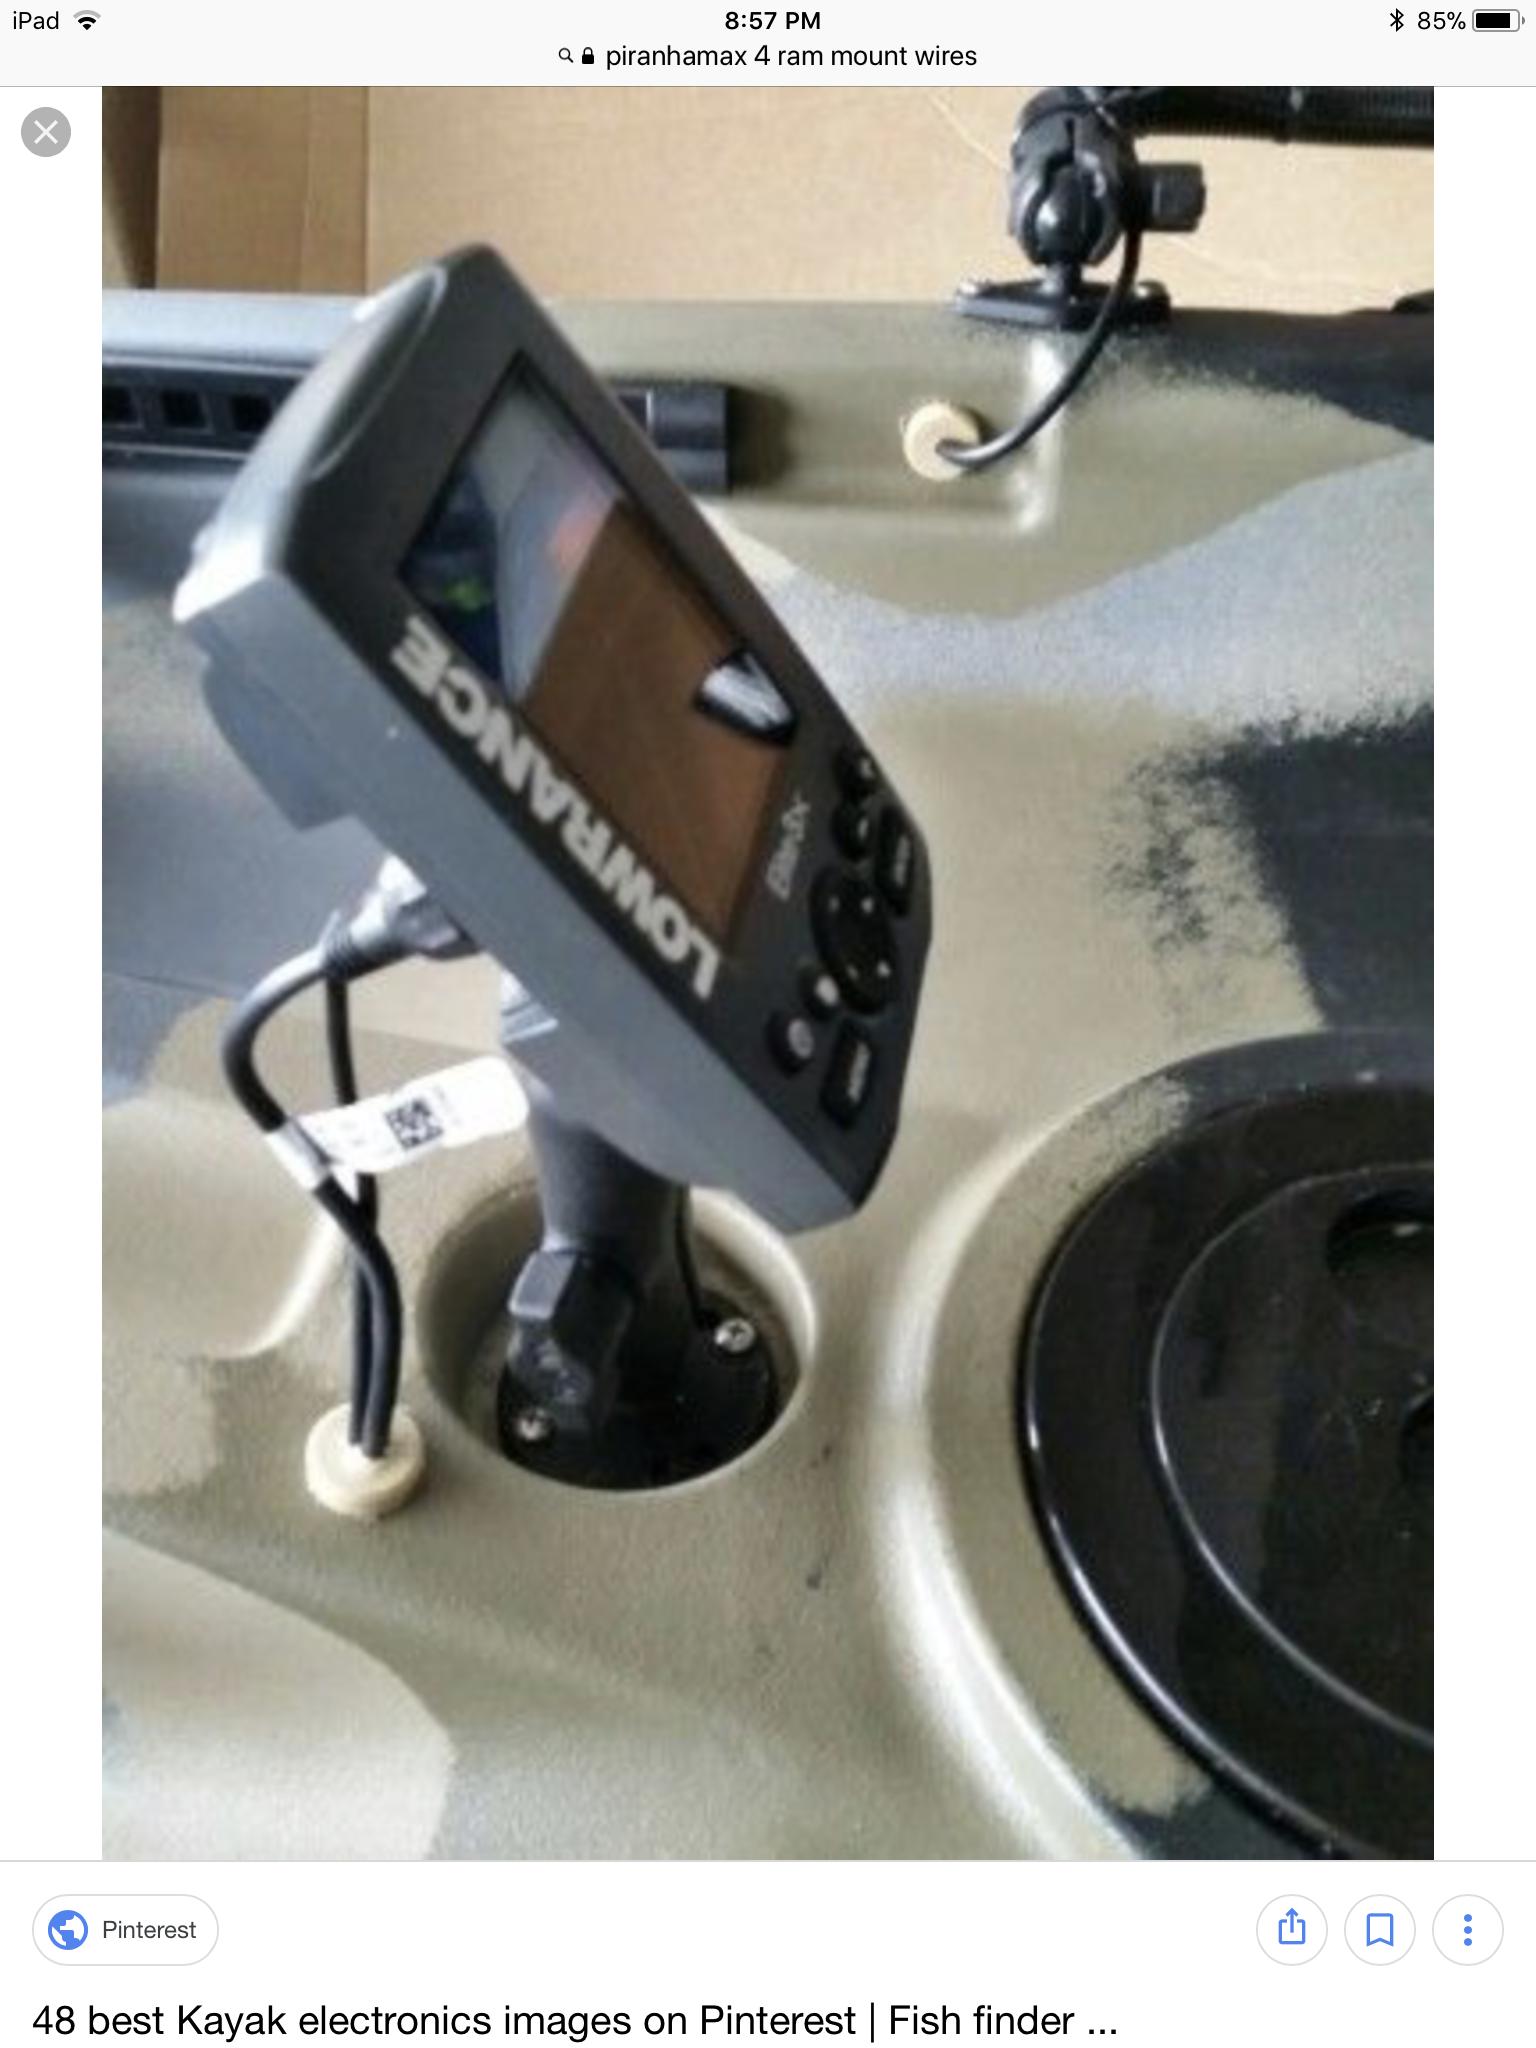 Wire or transducer pass thru plugs? See photo — Florida Sportsman